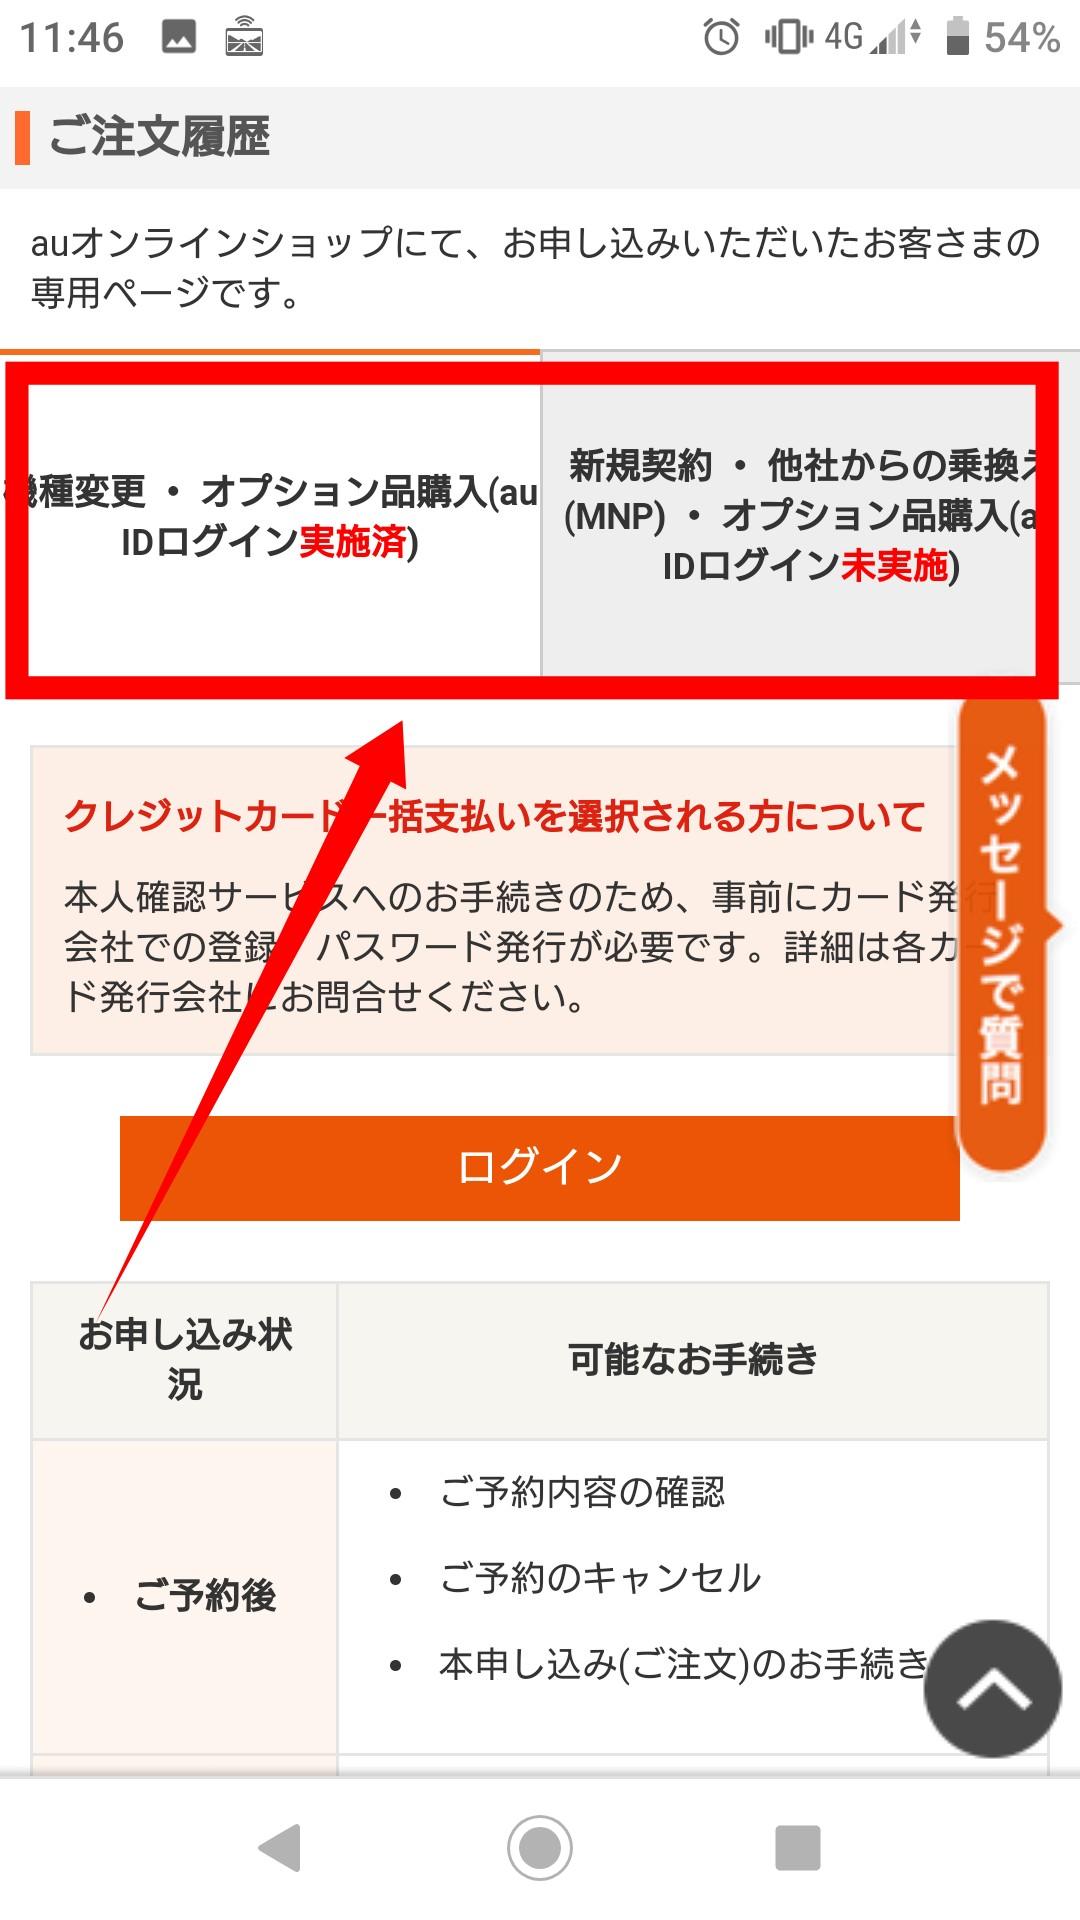 auオンラインショップ予約キャンセル